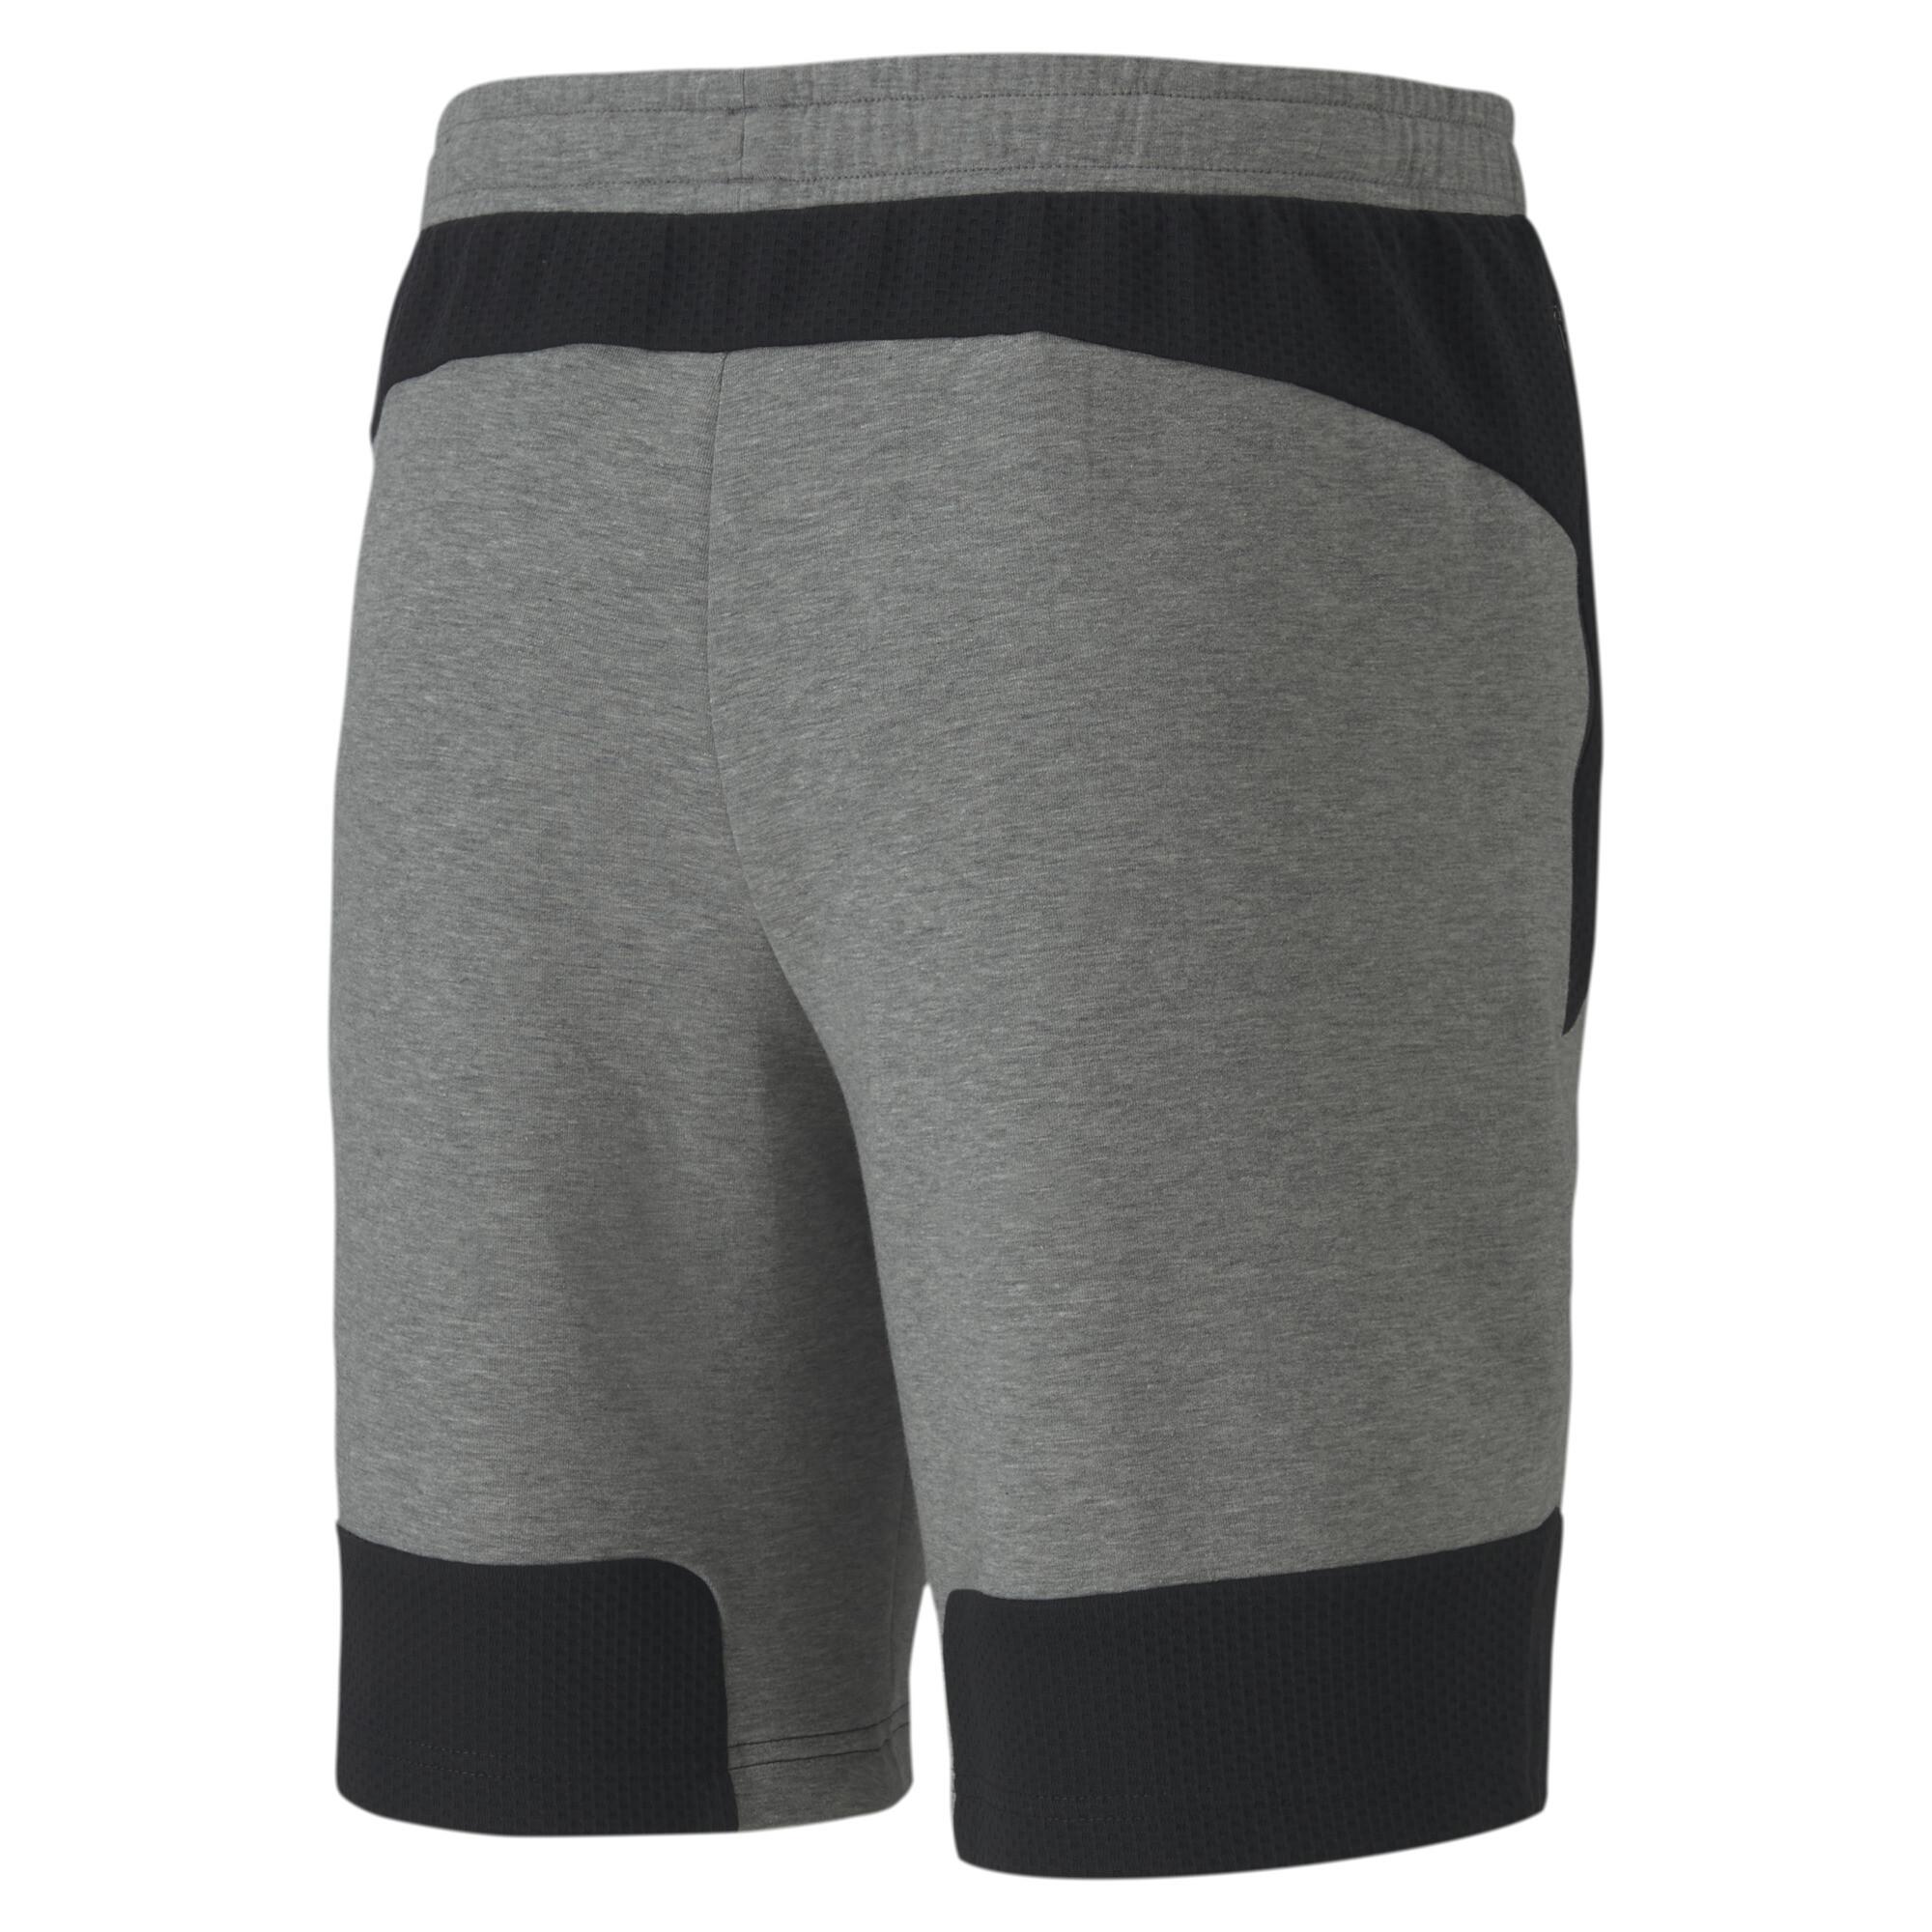 PUMA-Evostripe-Men-039-s-Shorts-Men-Knitted-Shorts-Basics thumbnail 14